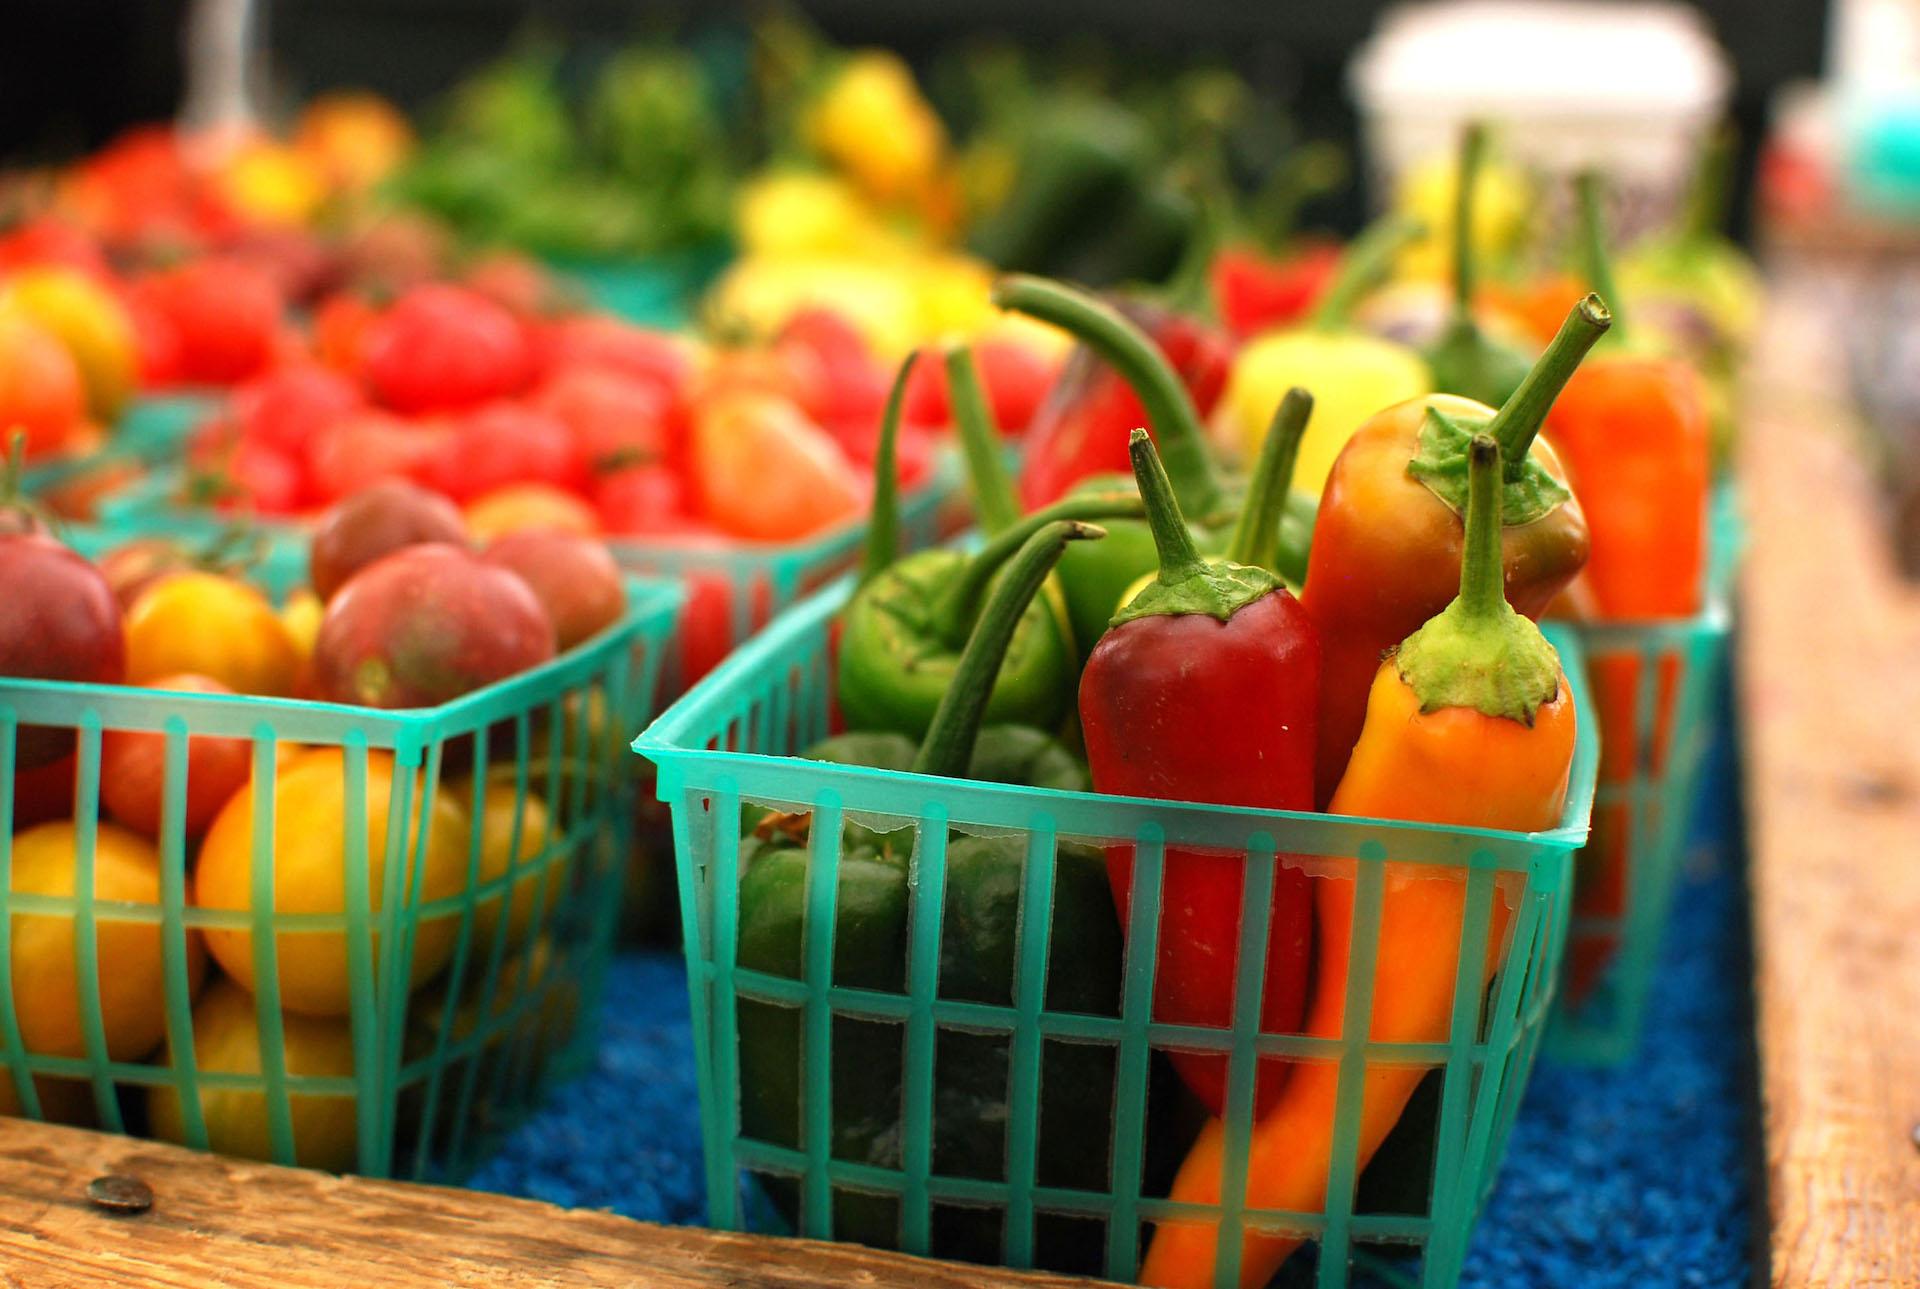 An assortment of peppers